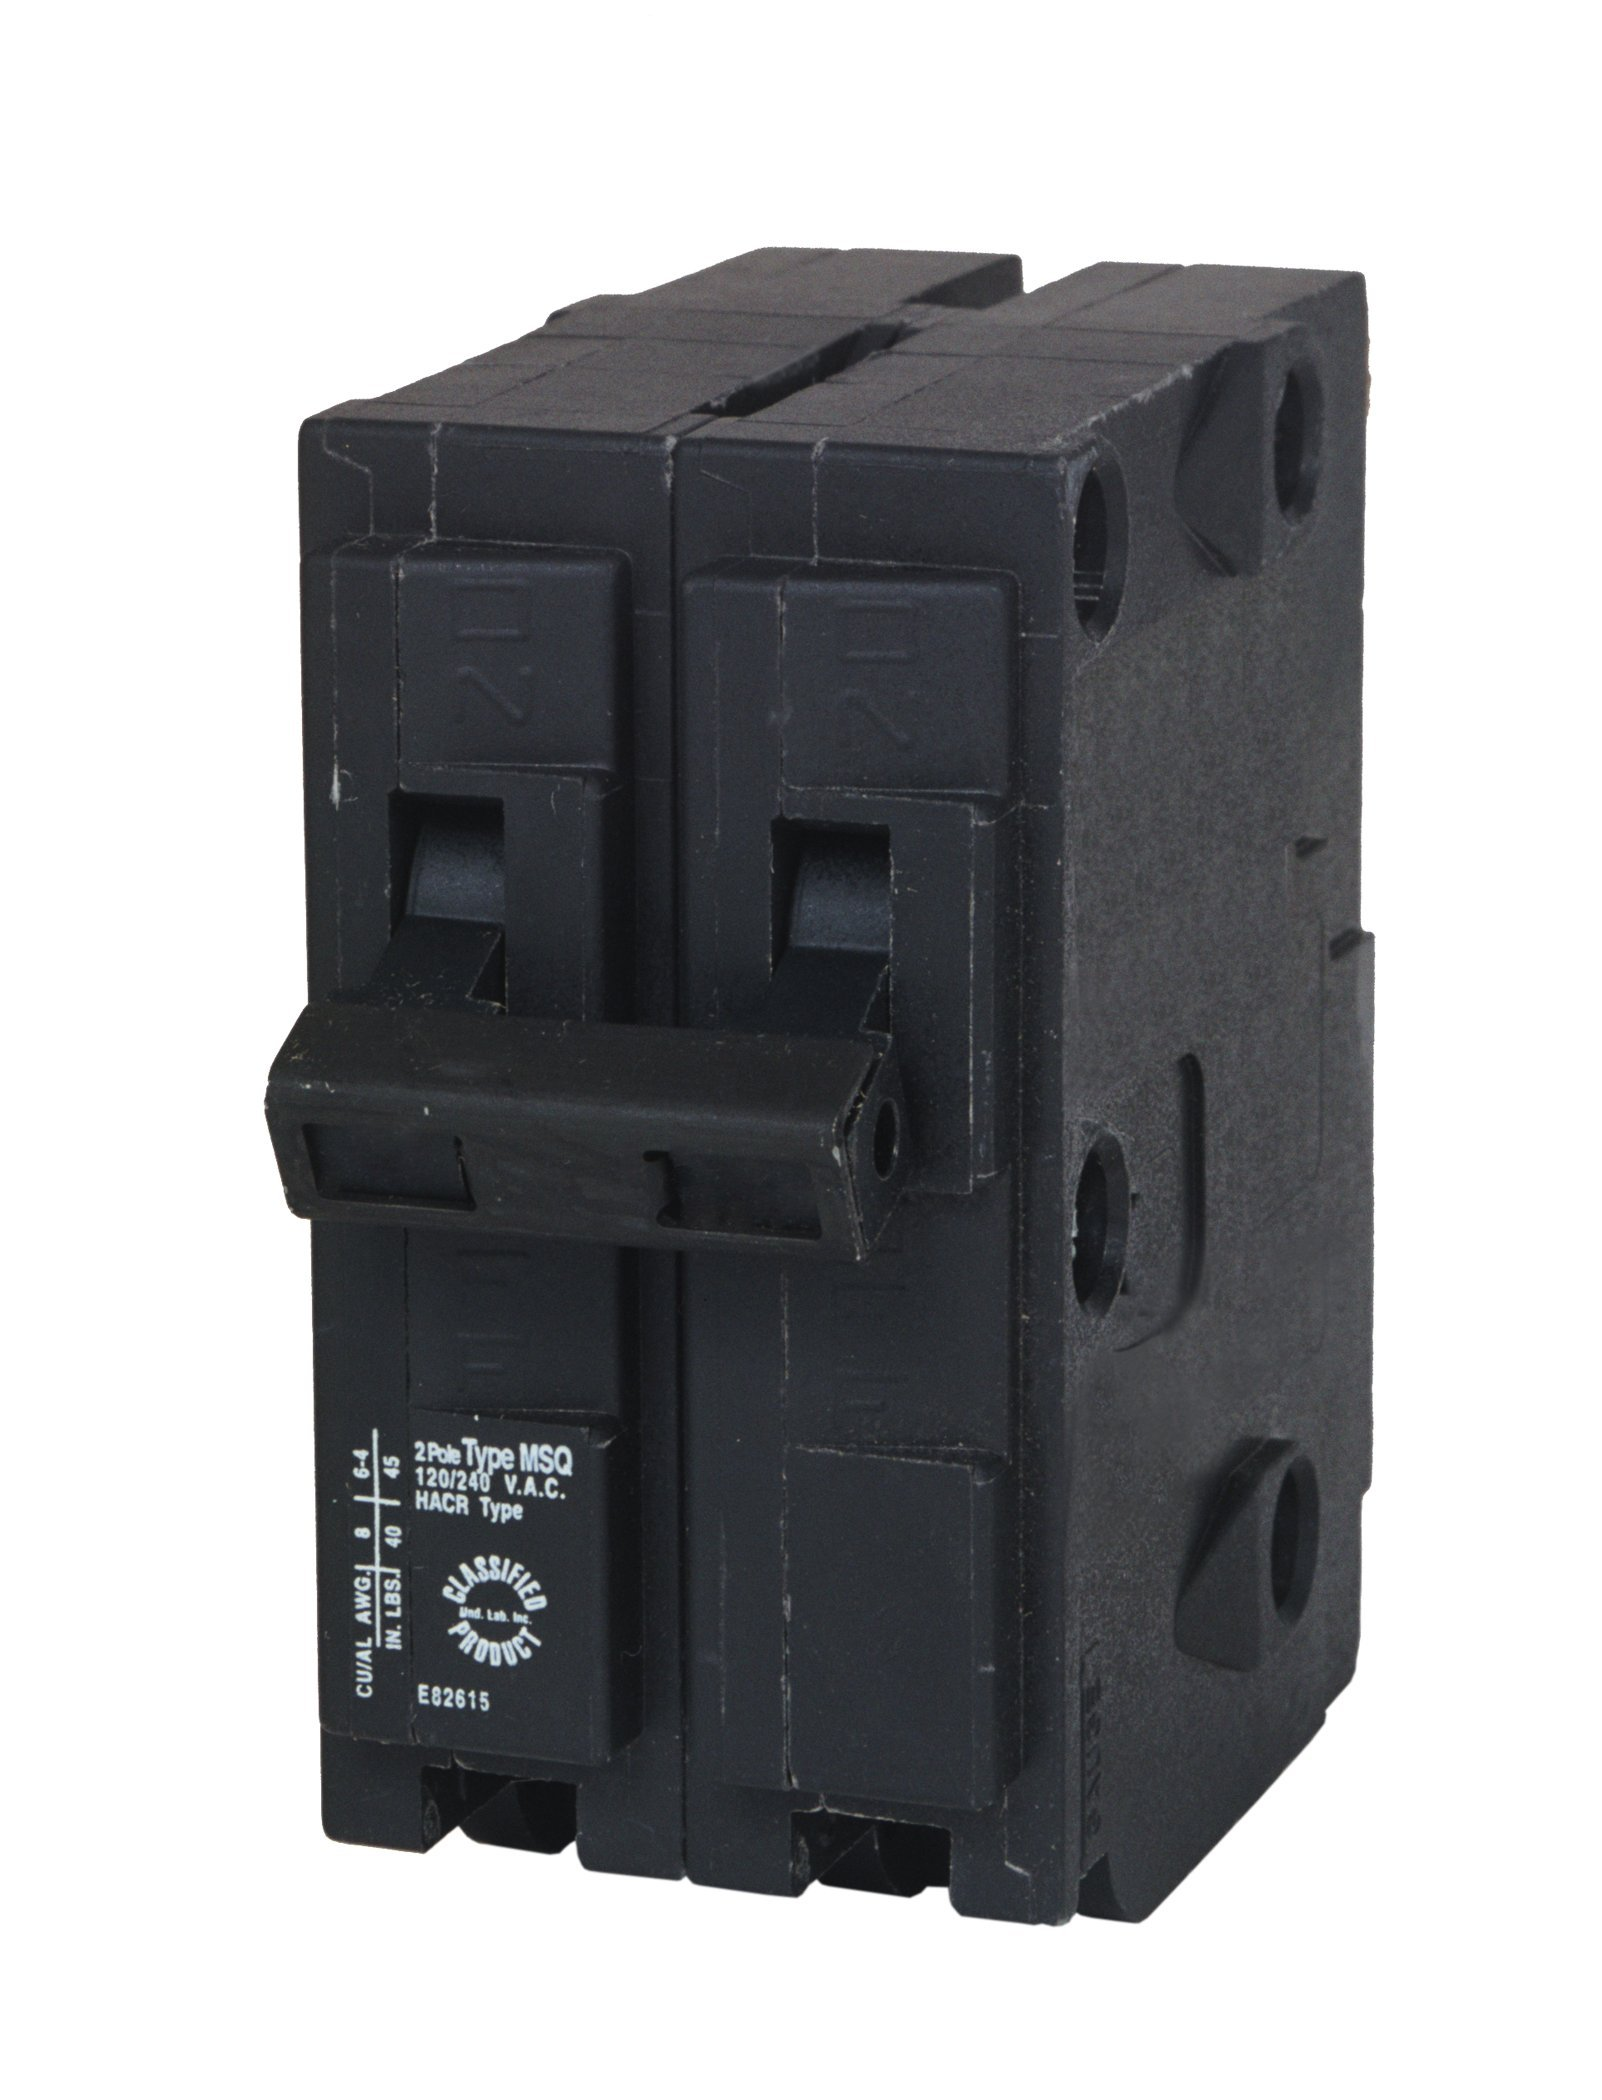 MP2125 125-Amp Double Pole Type MP-T Circuit Breaker